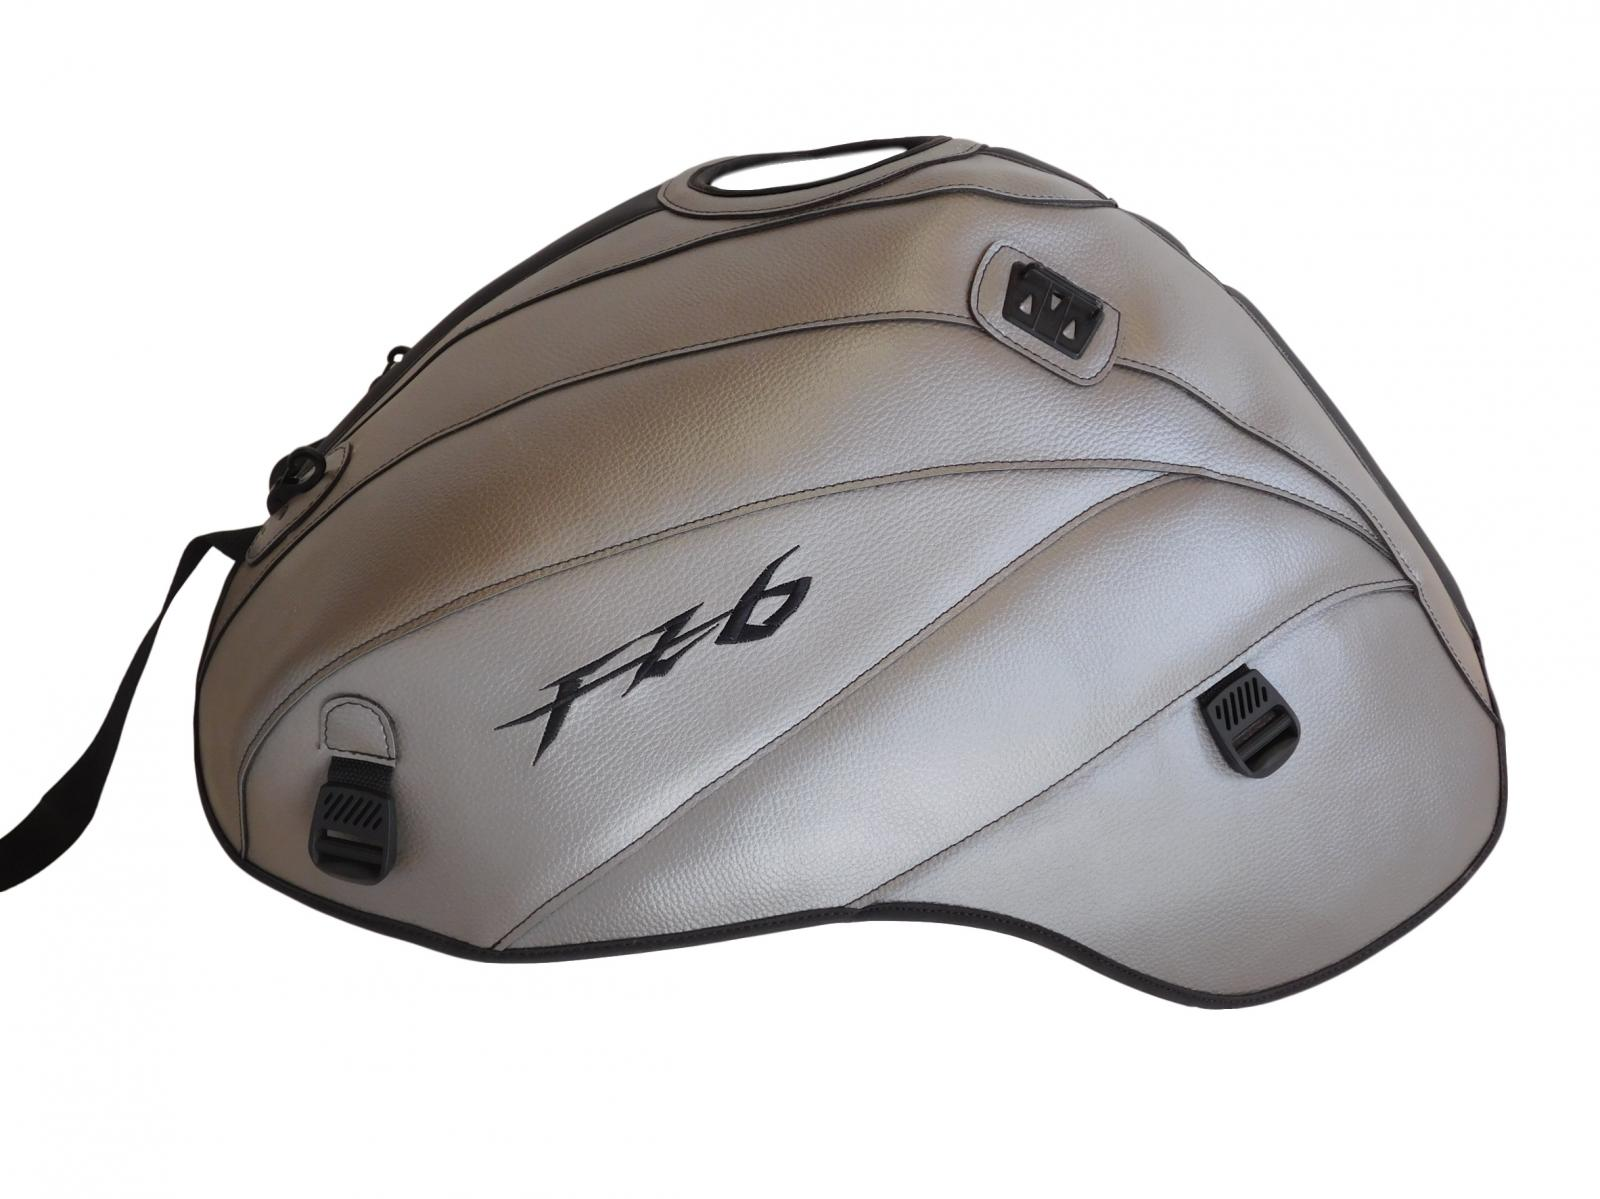 Tapis Prot Ge R Servoir Tpr5160 Yamaha Fz6 Fazer 600 2003 Tarifs Pour Belgique